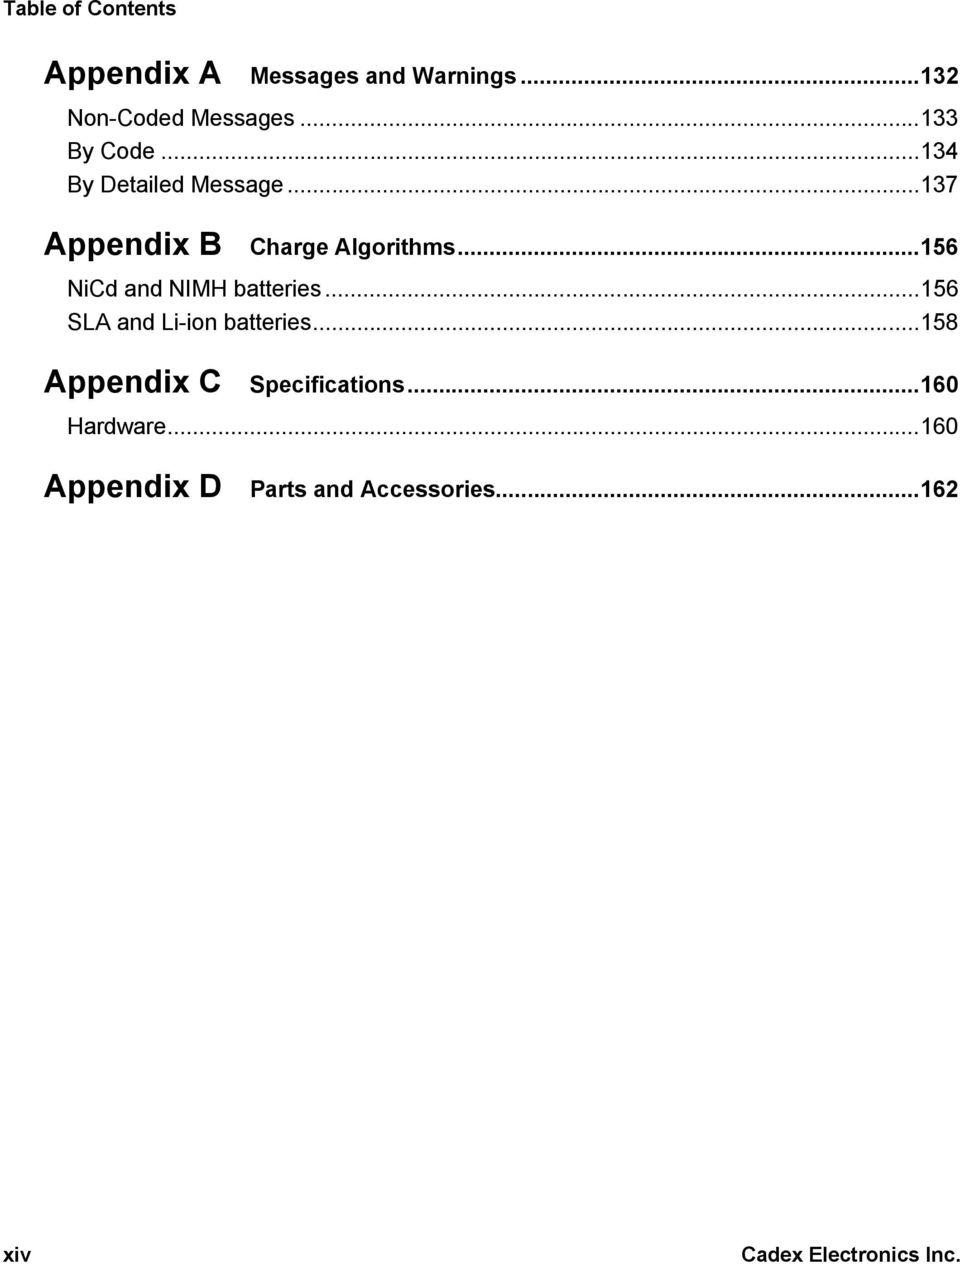 page_14?resize\\\\\\\=665%2C876 kenwood kdc 158 wiring gandul 45 77 79 119 kenwood kdc-158u wiring diagram at honlapkeszites.co